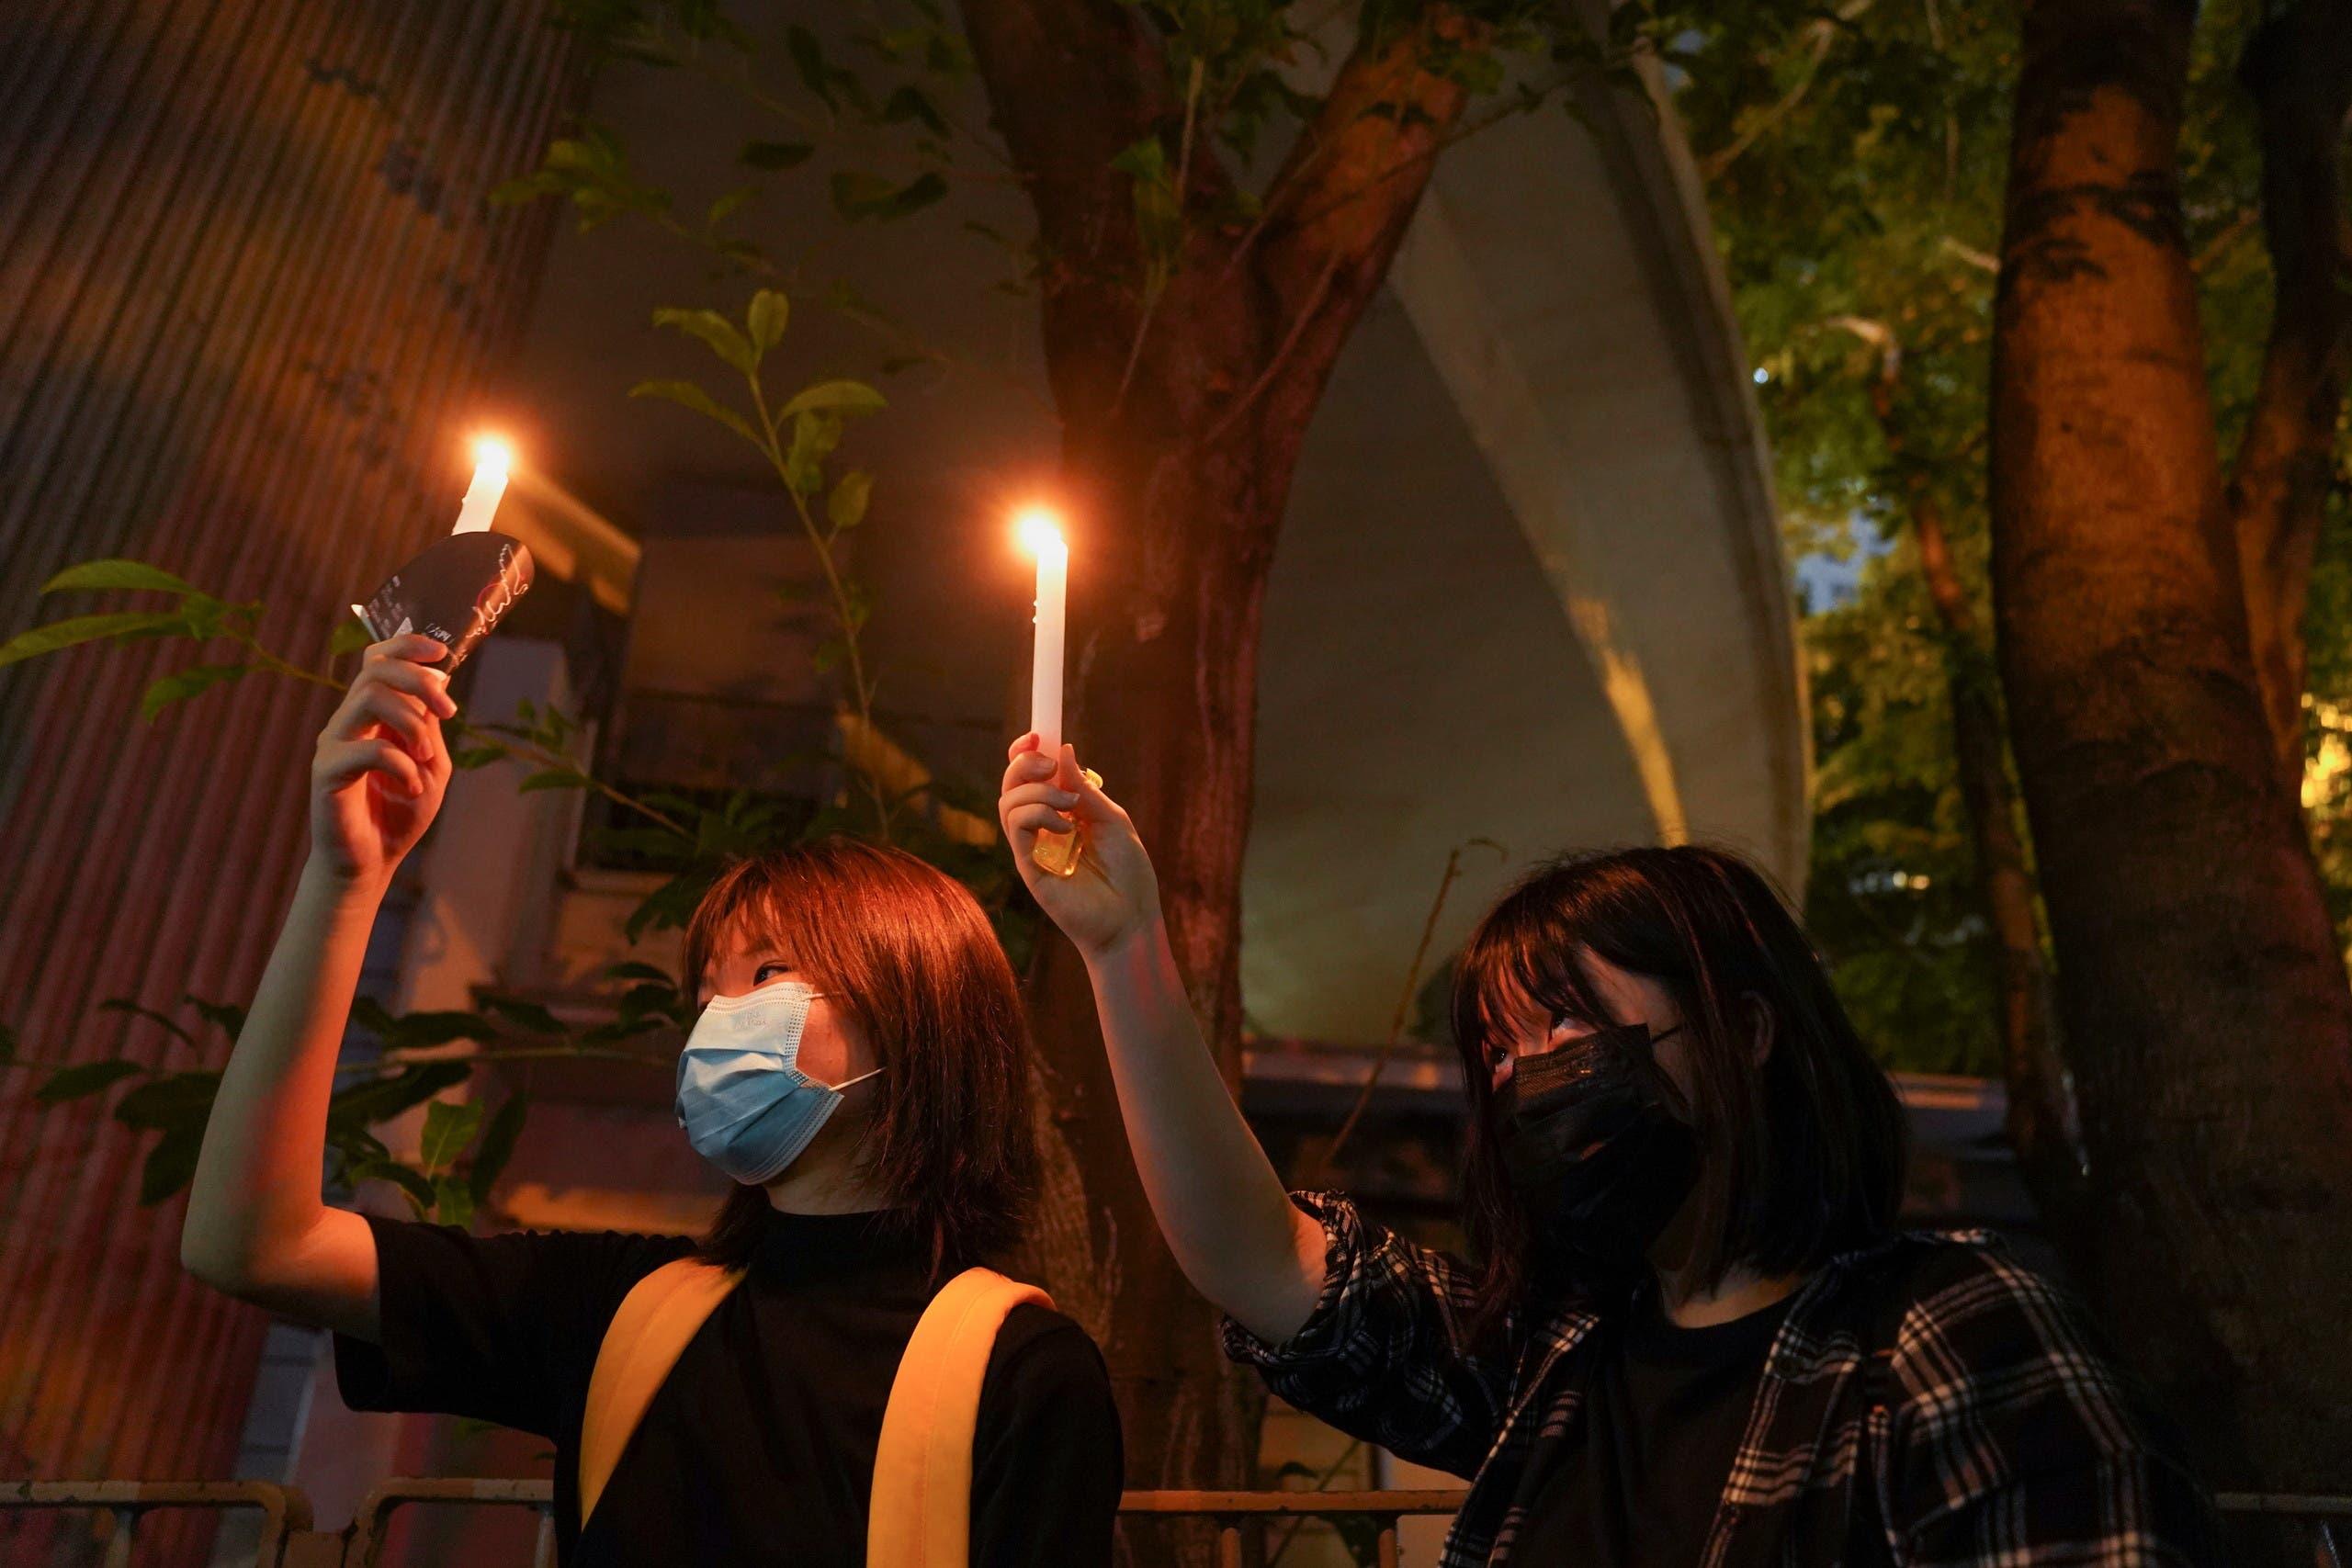 Hong Kong residents light candles on Friday night